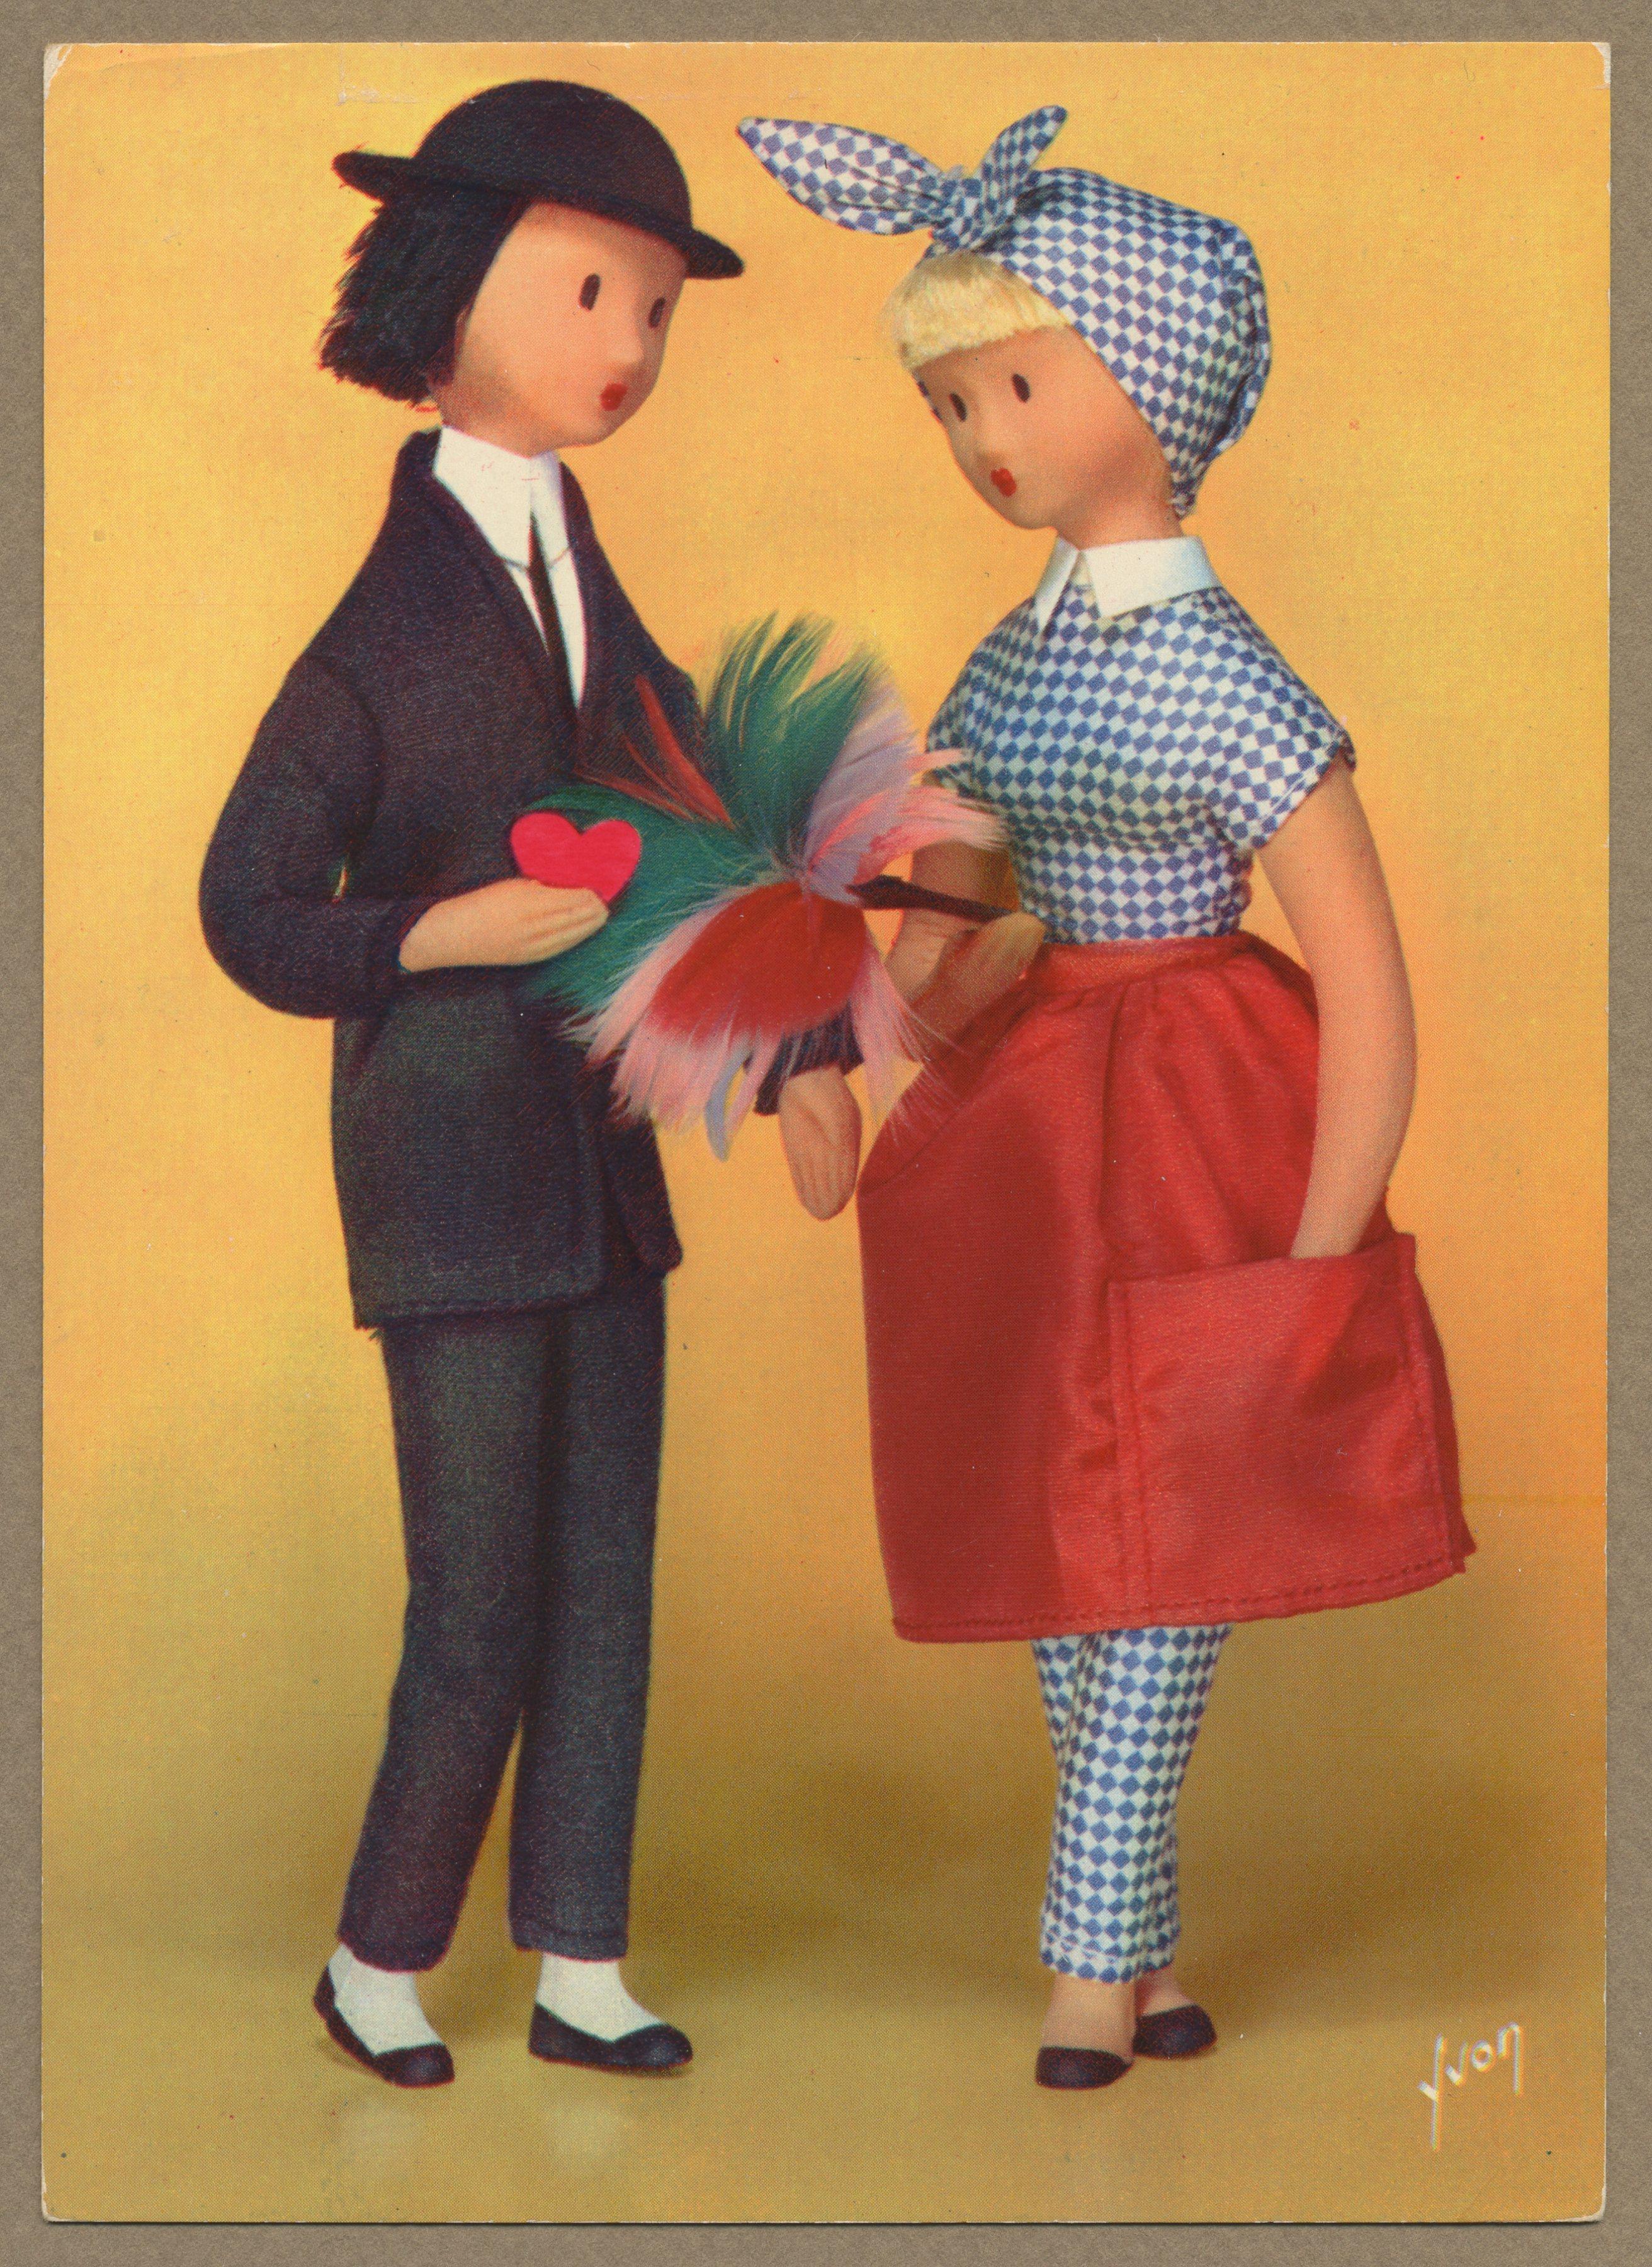 Феникс, открытка с марионеткой